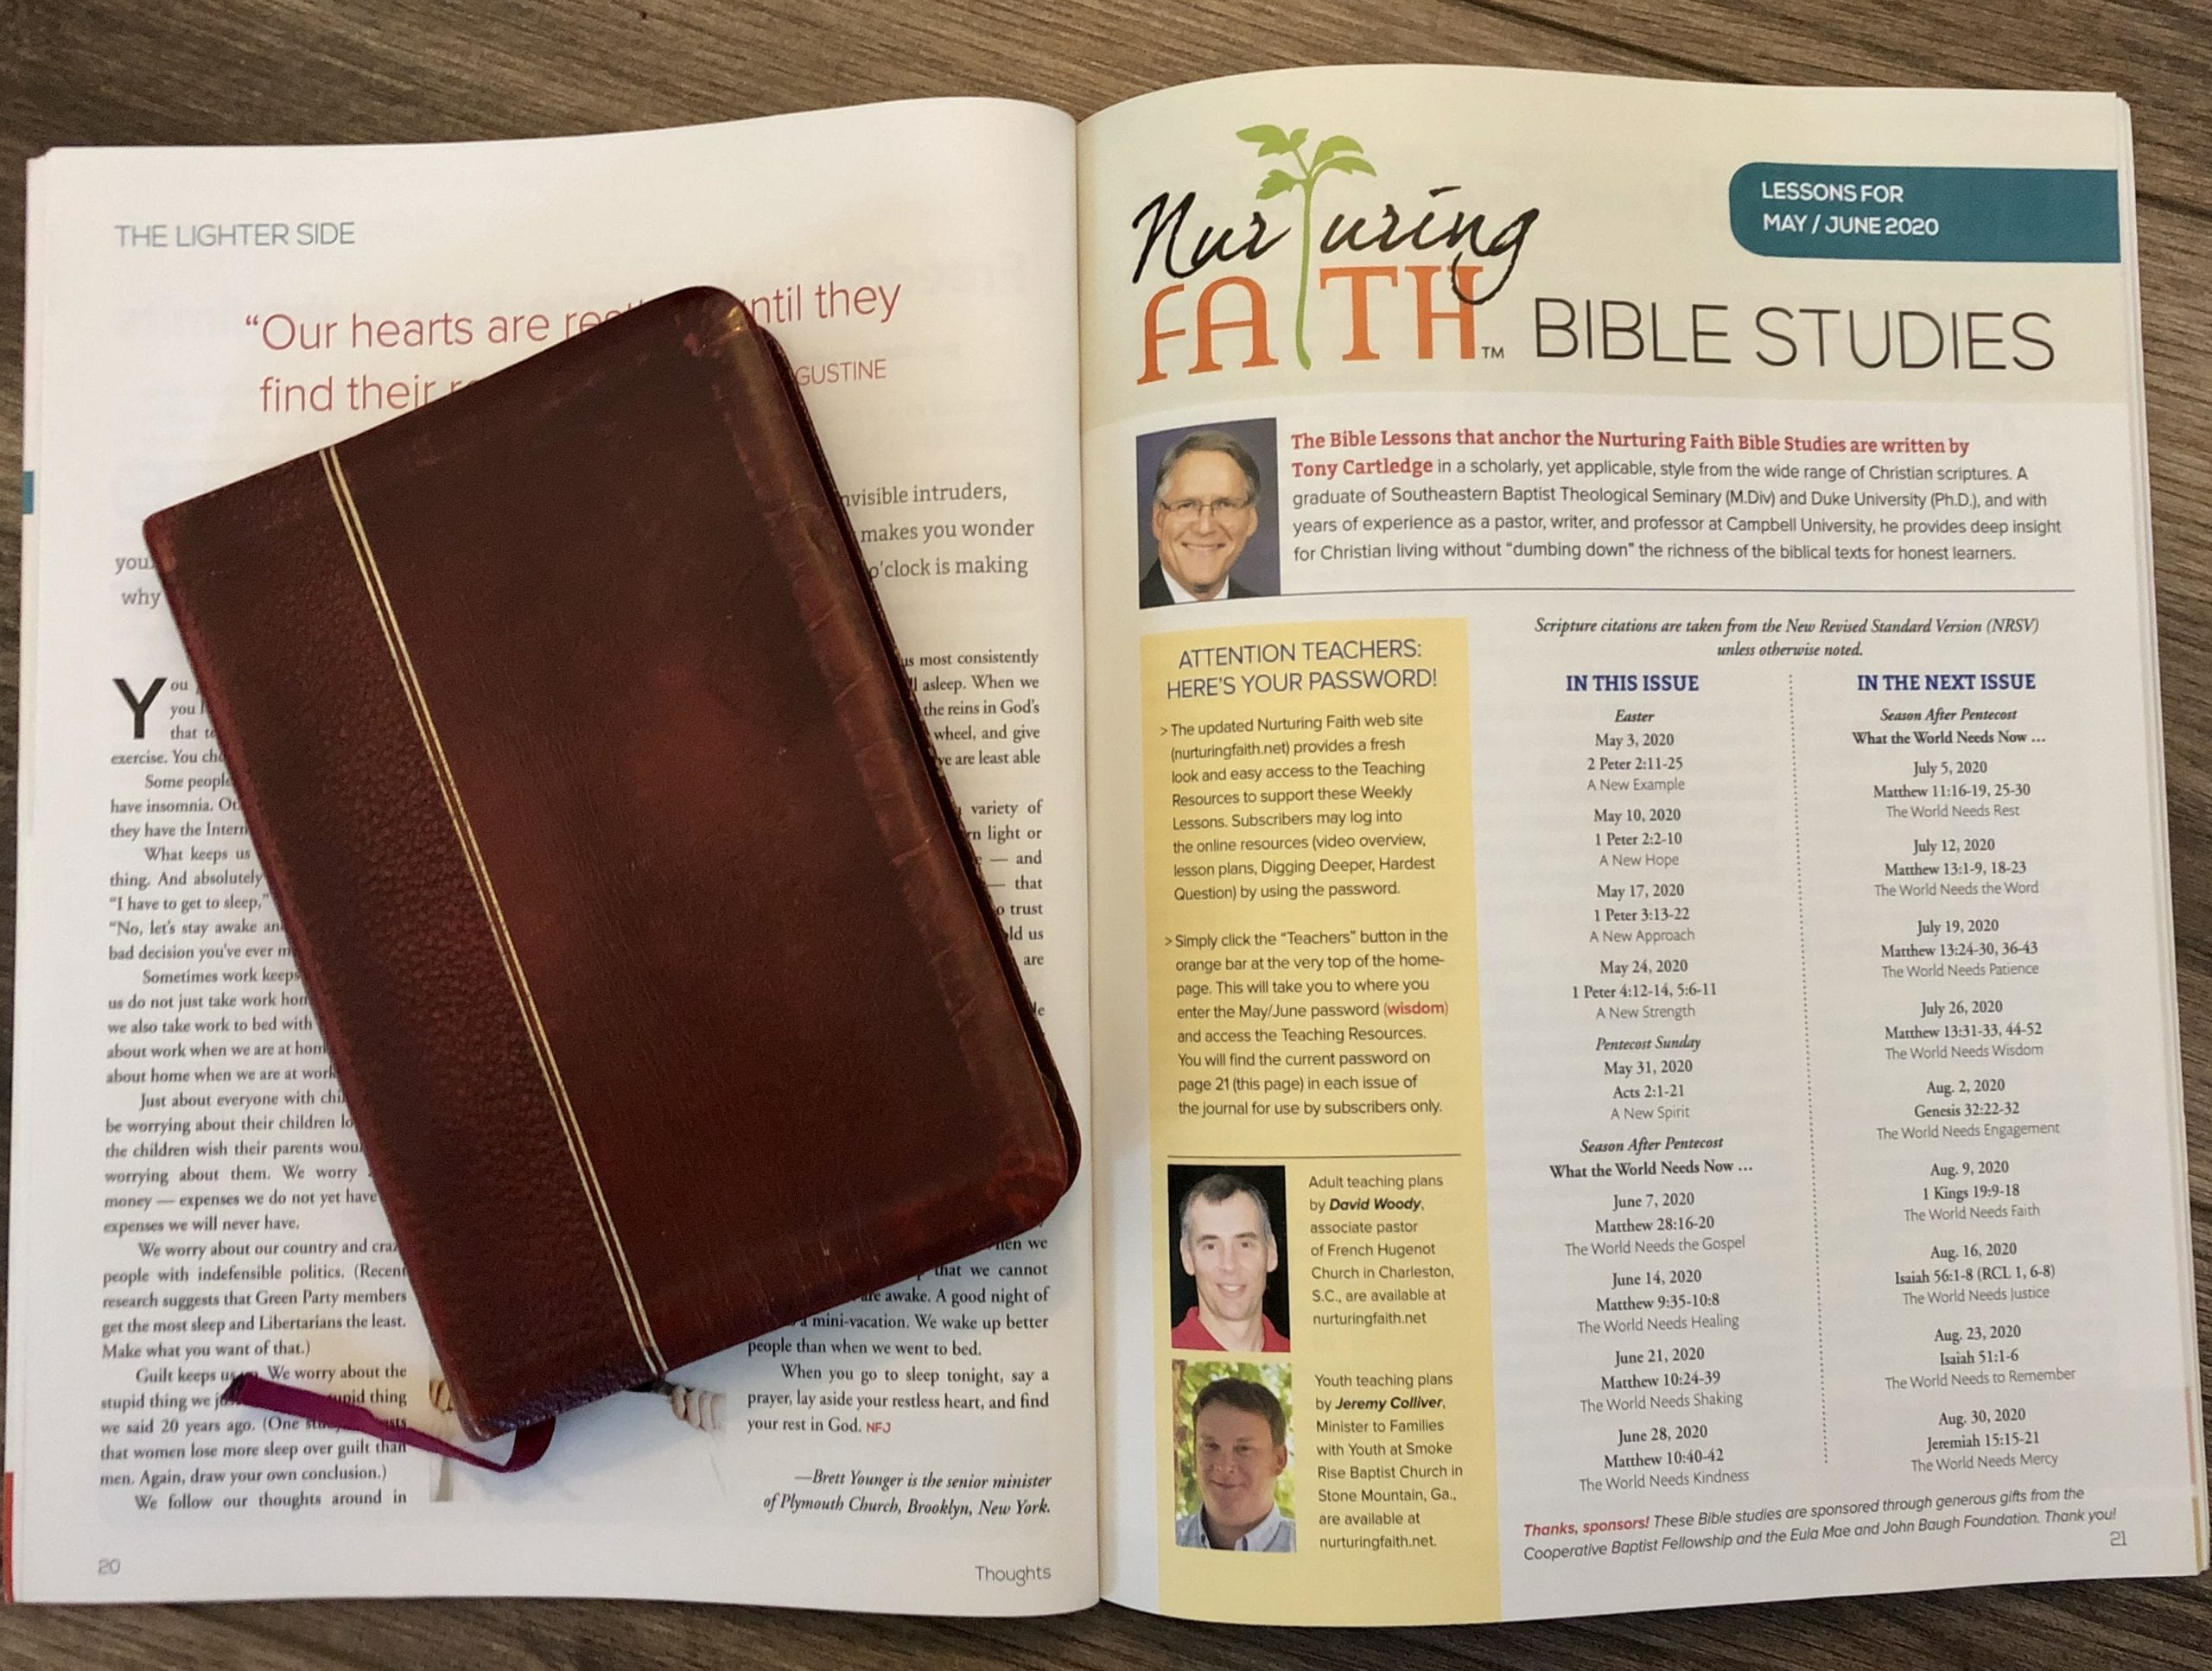 Nurturing Faith extends free Bible study resources through June